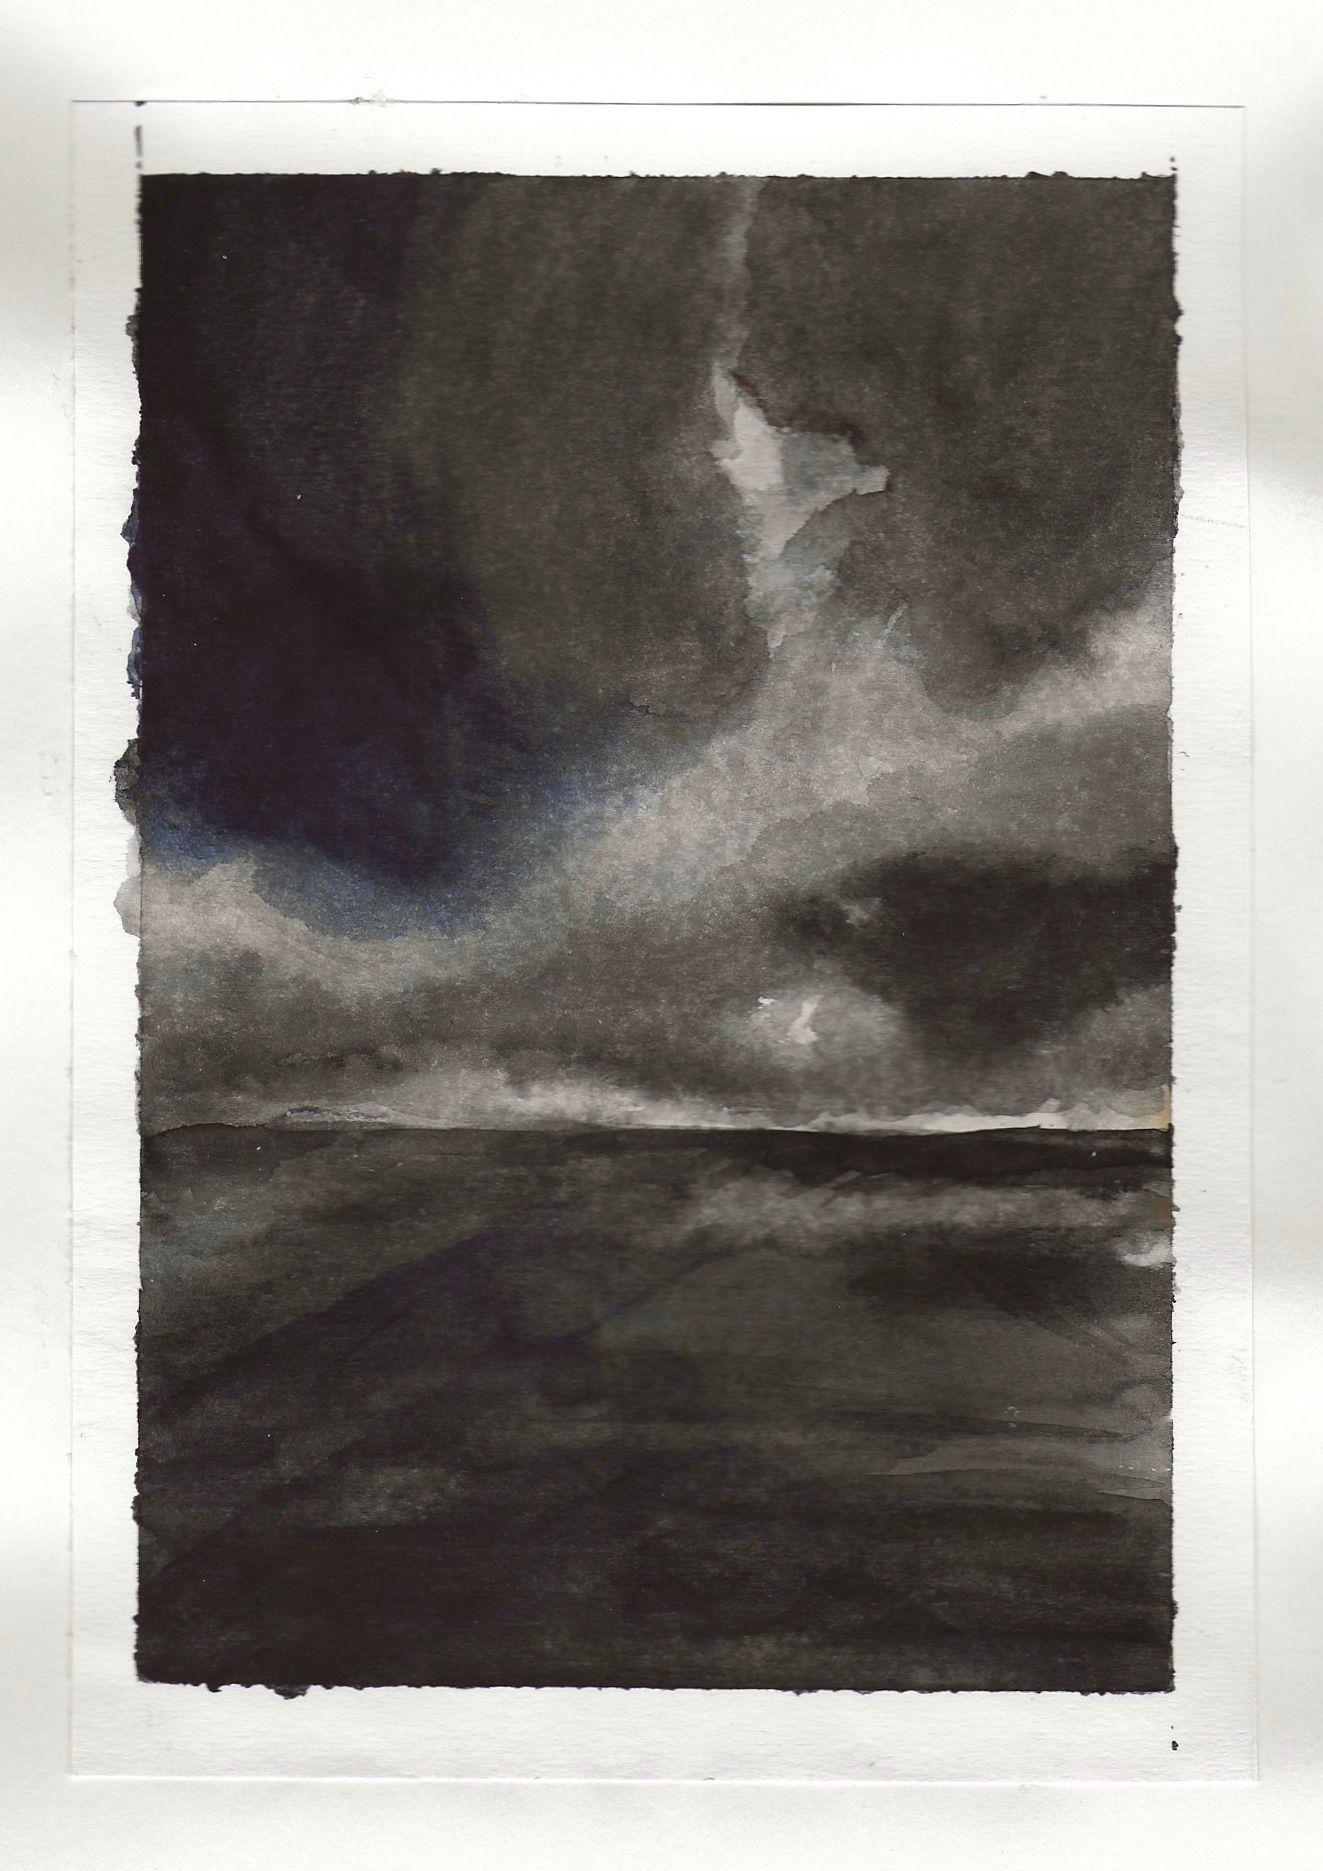 watercolour studies - sequence 1 - #2 - watercolour - 148 x 210mm - 200gsm 120lb